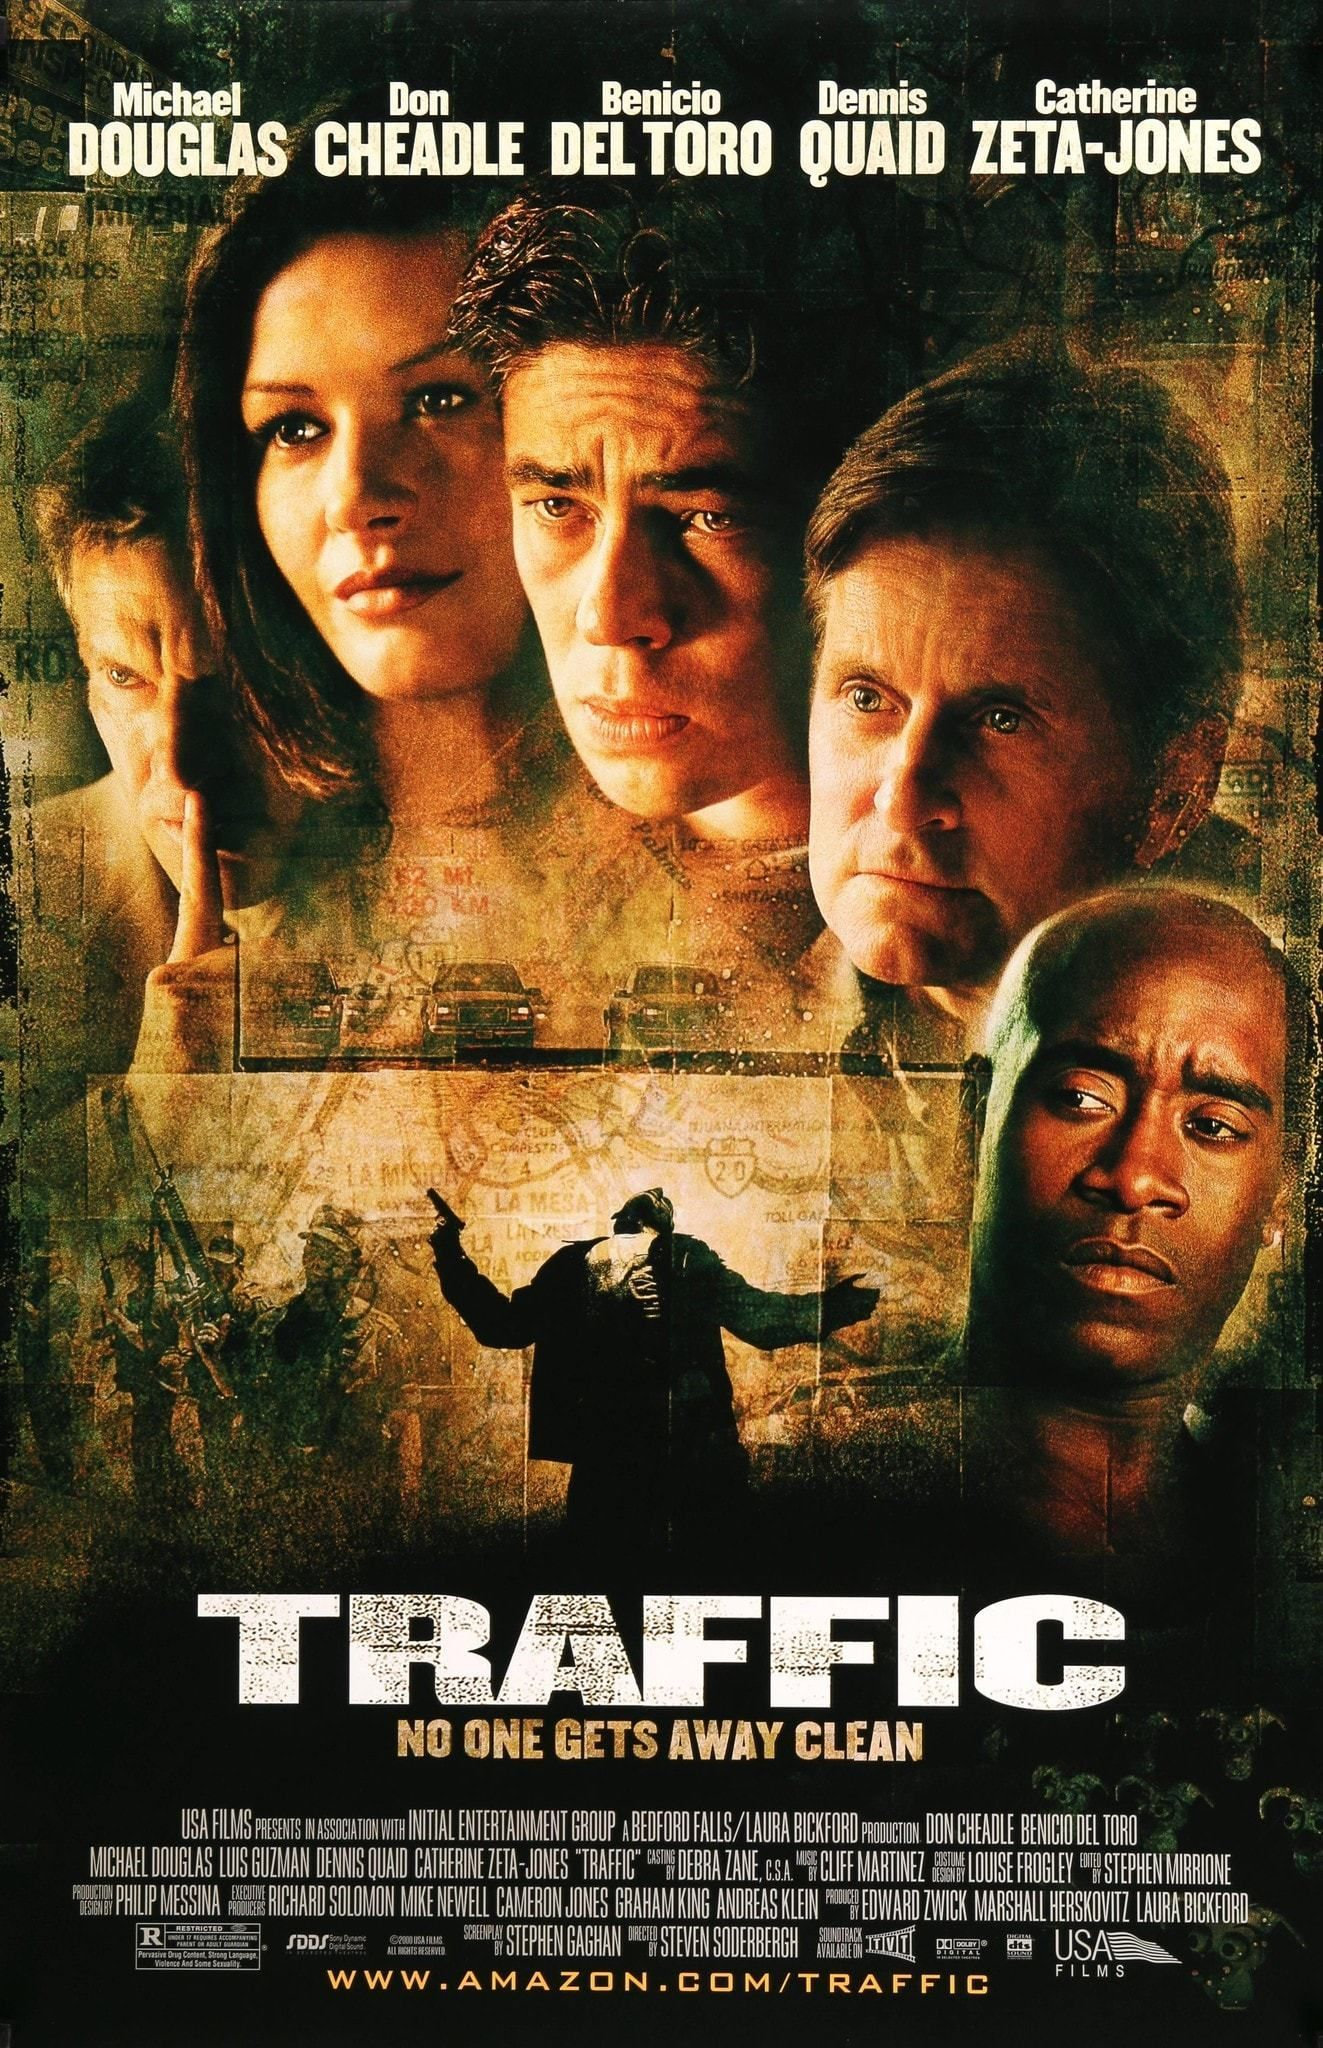 Traffic 2000 Good Movies On Netflix Full Movies Online Free Full Movies